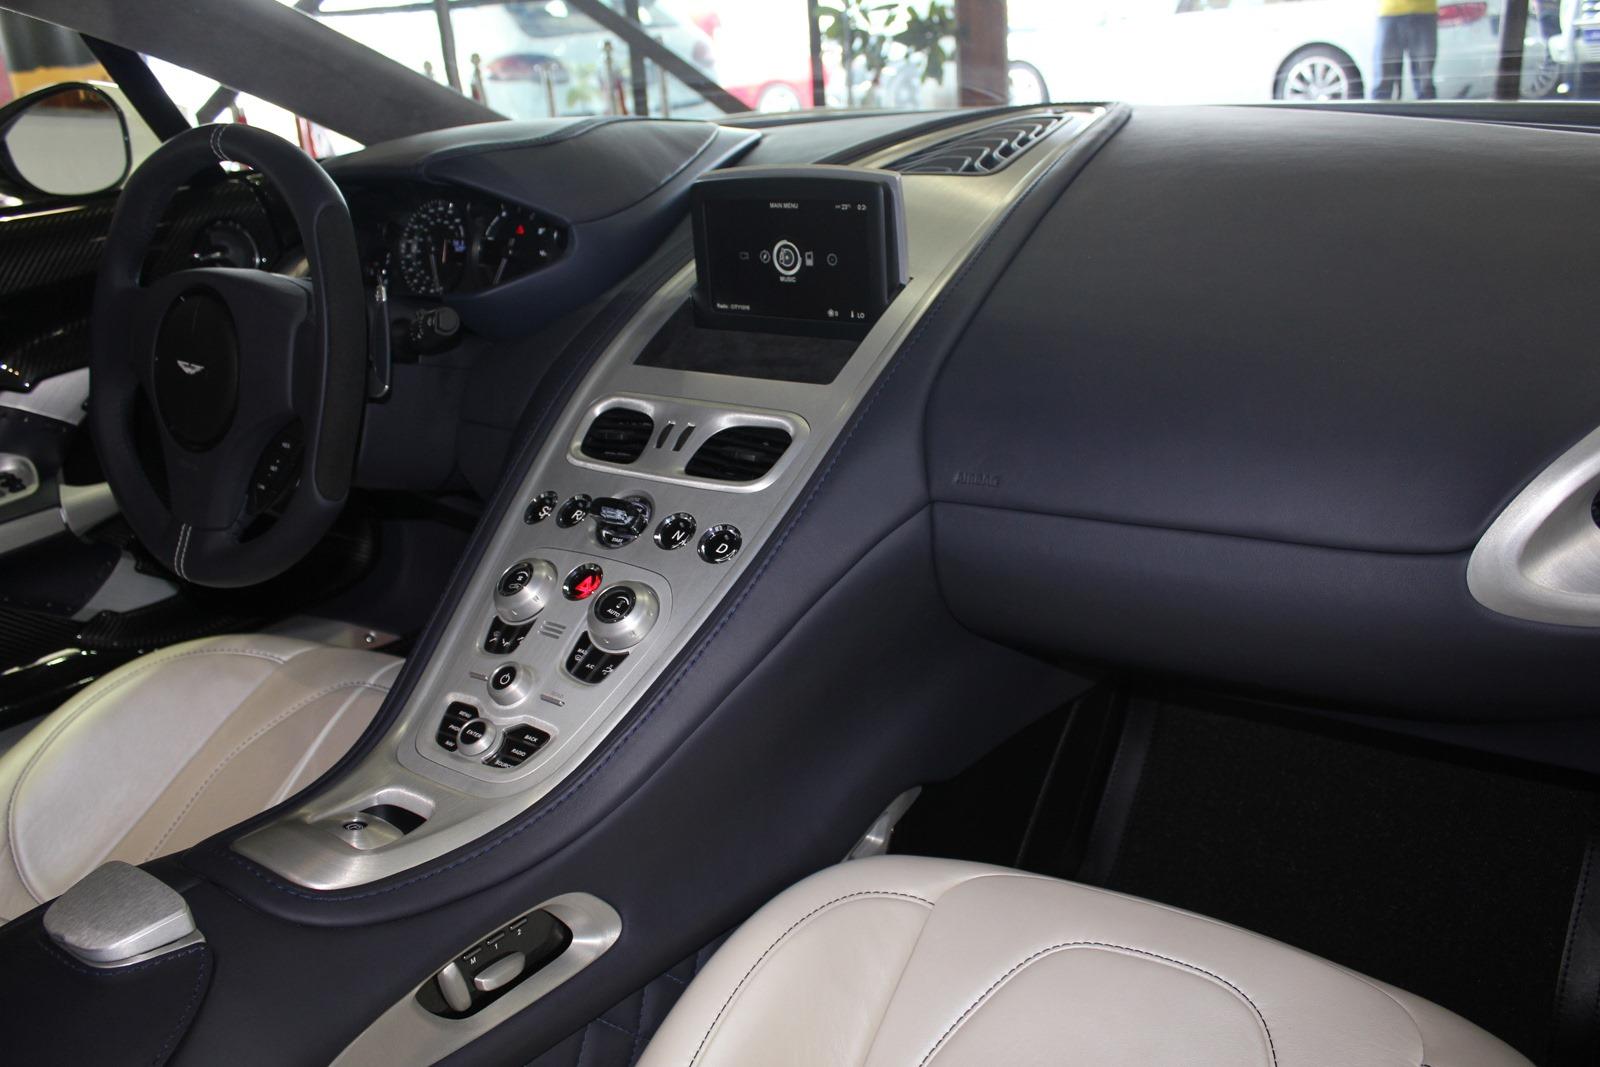 Aston-Martin-One-77-15%25255B3%25255D.jpg